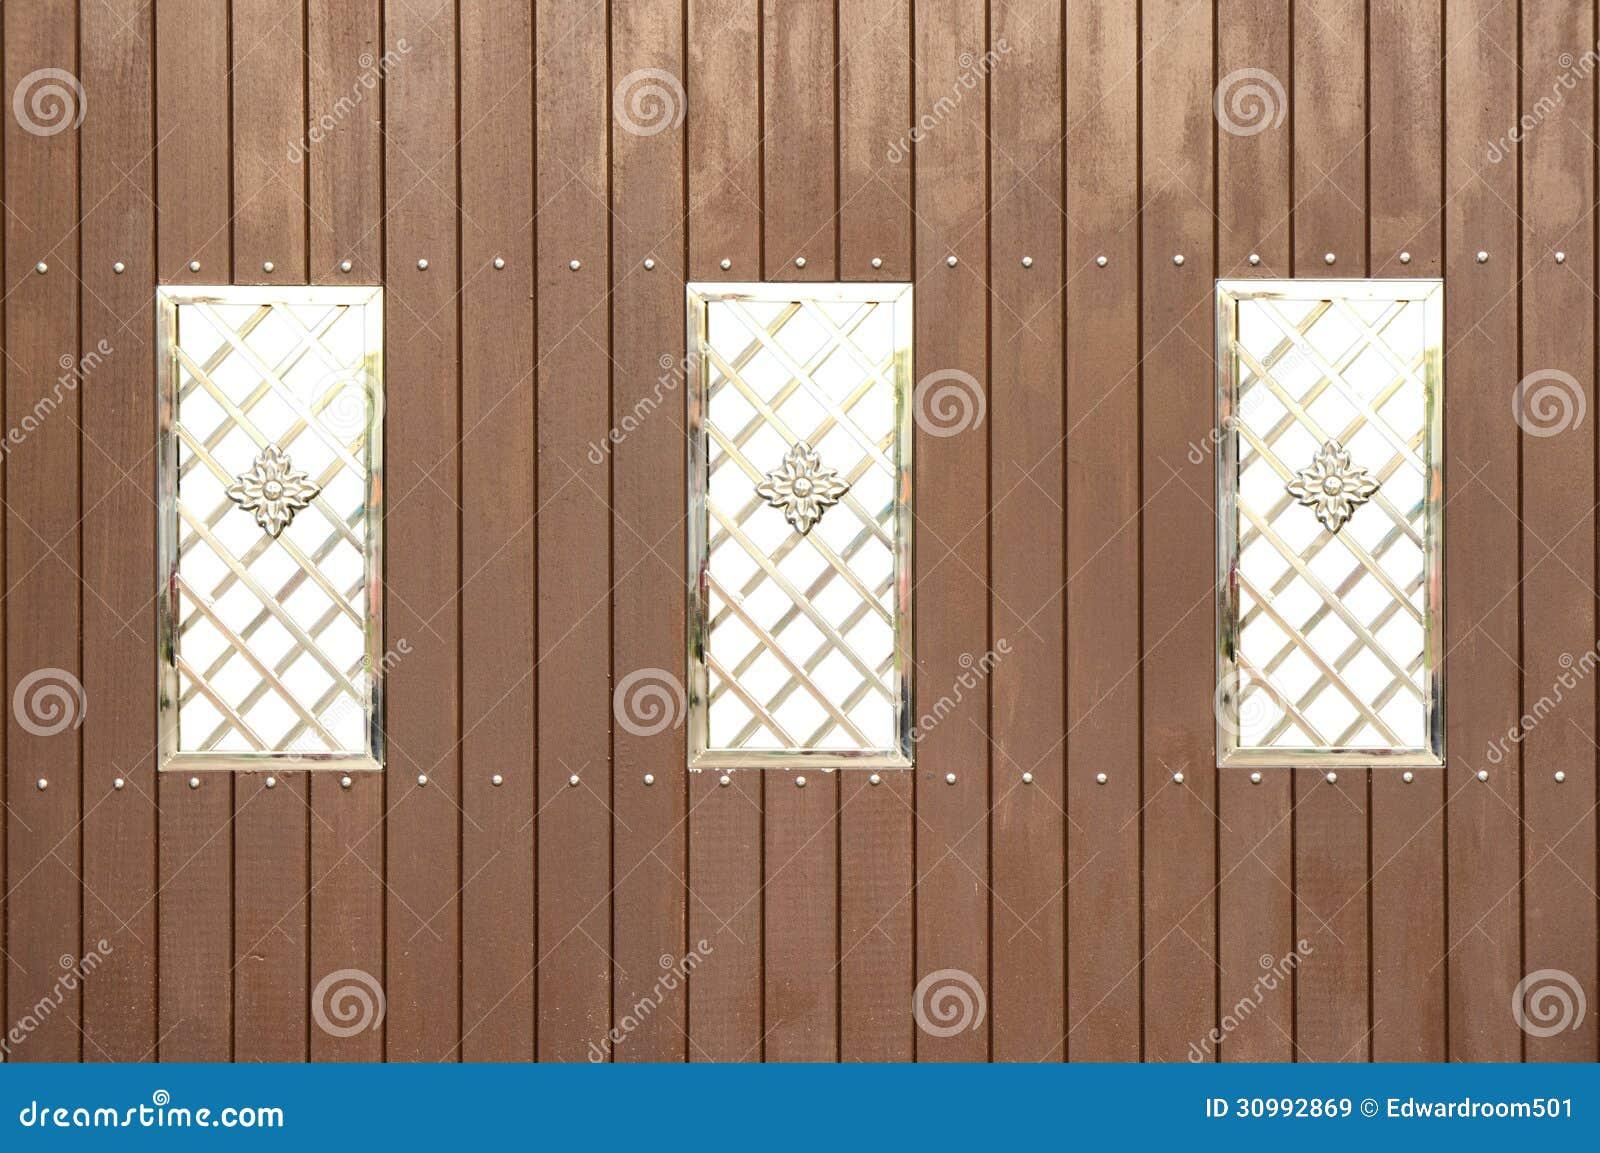 Wood Modern Stil För Staket Royaltyfria Bilder - Bild: 30992869